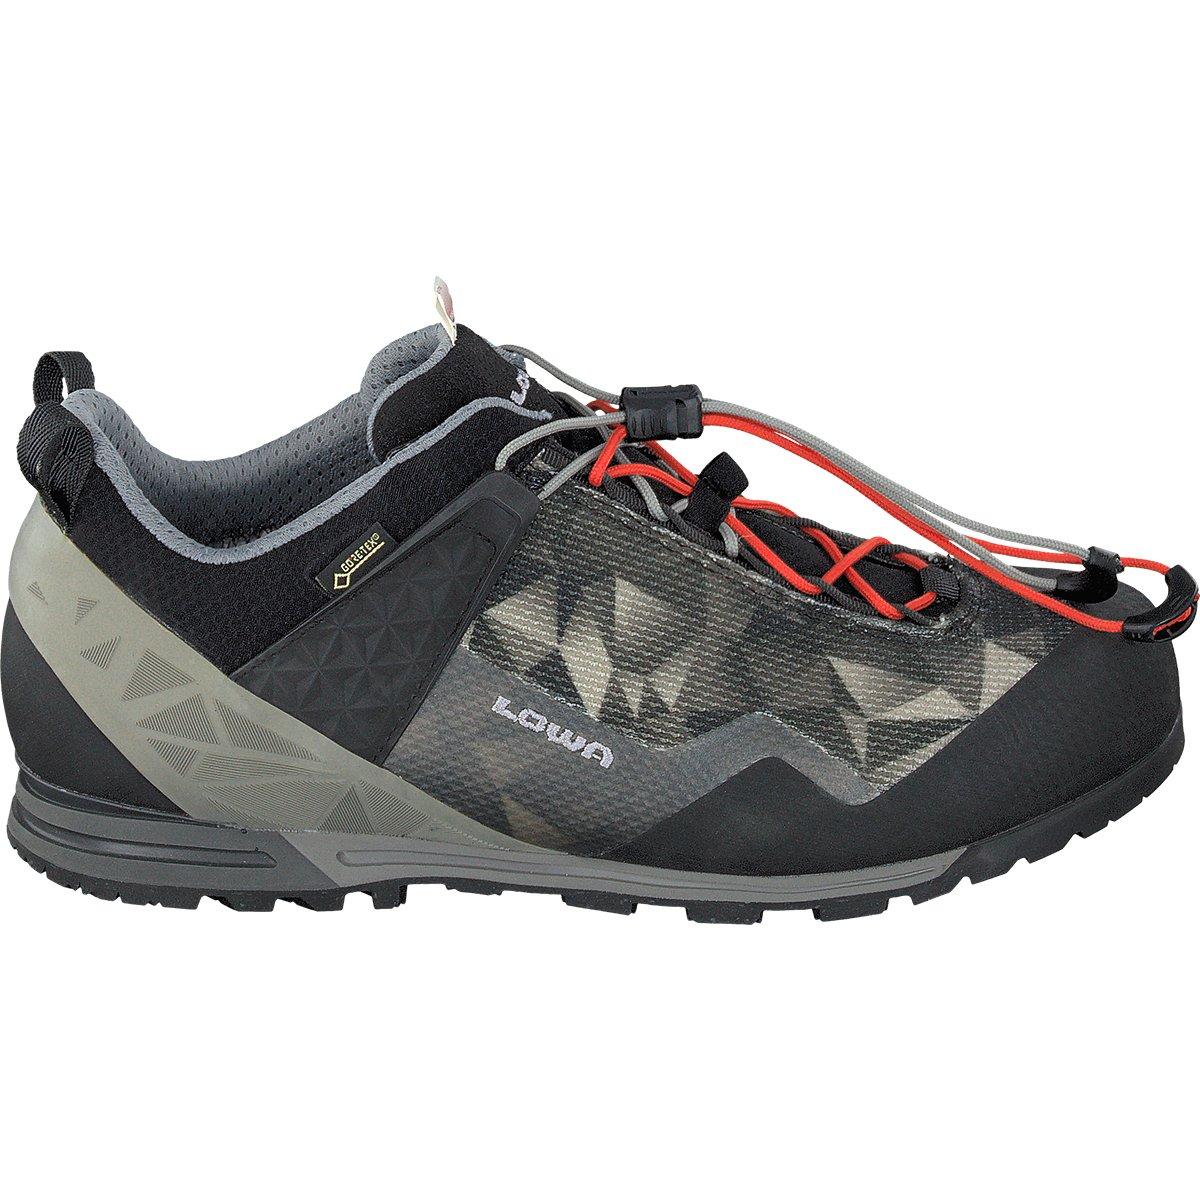 Approach Pro GTX Lo Schuhe